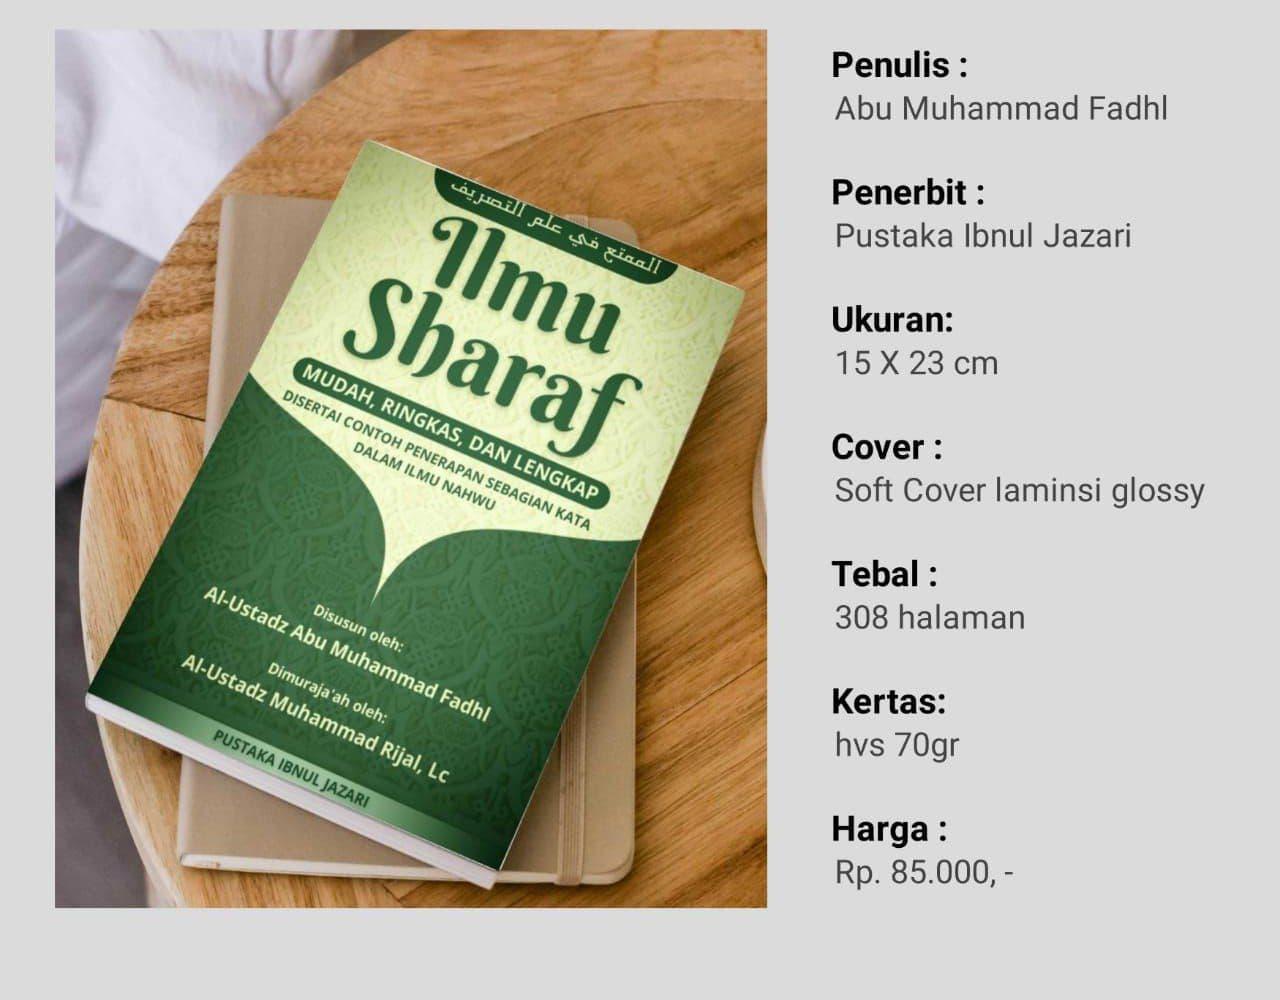 Buku Ilmu Sharaf Pustaka Ibnul Jazari